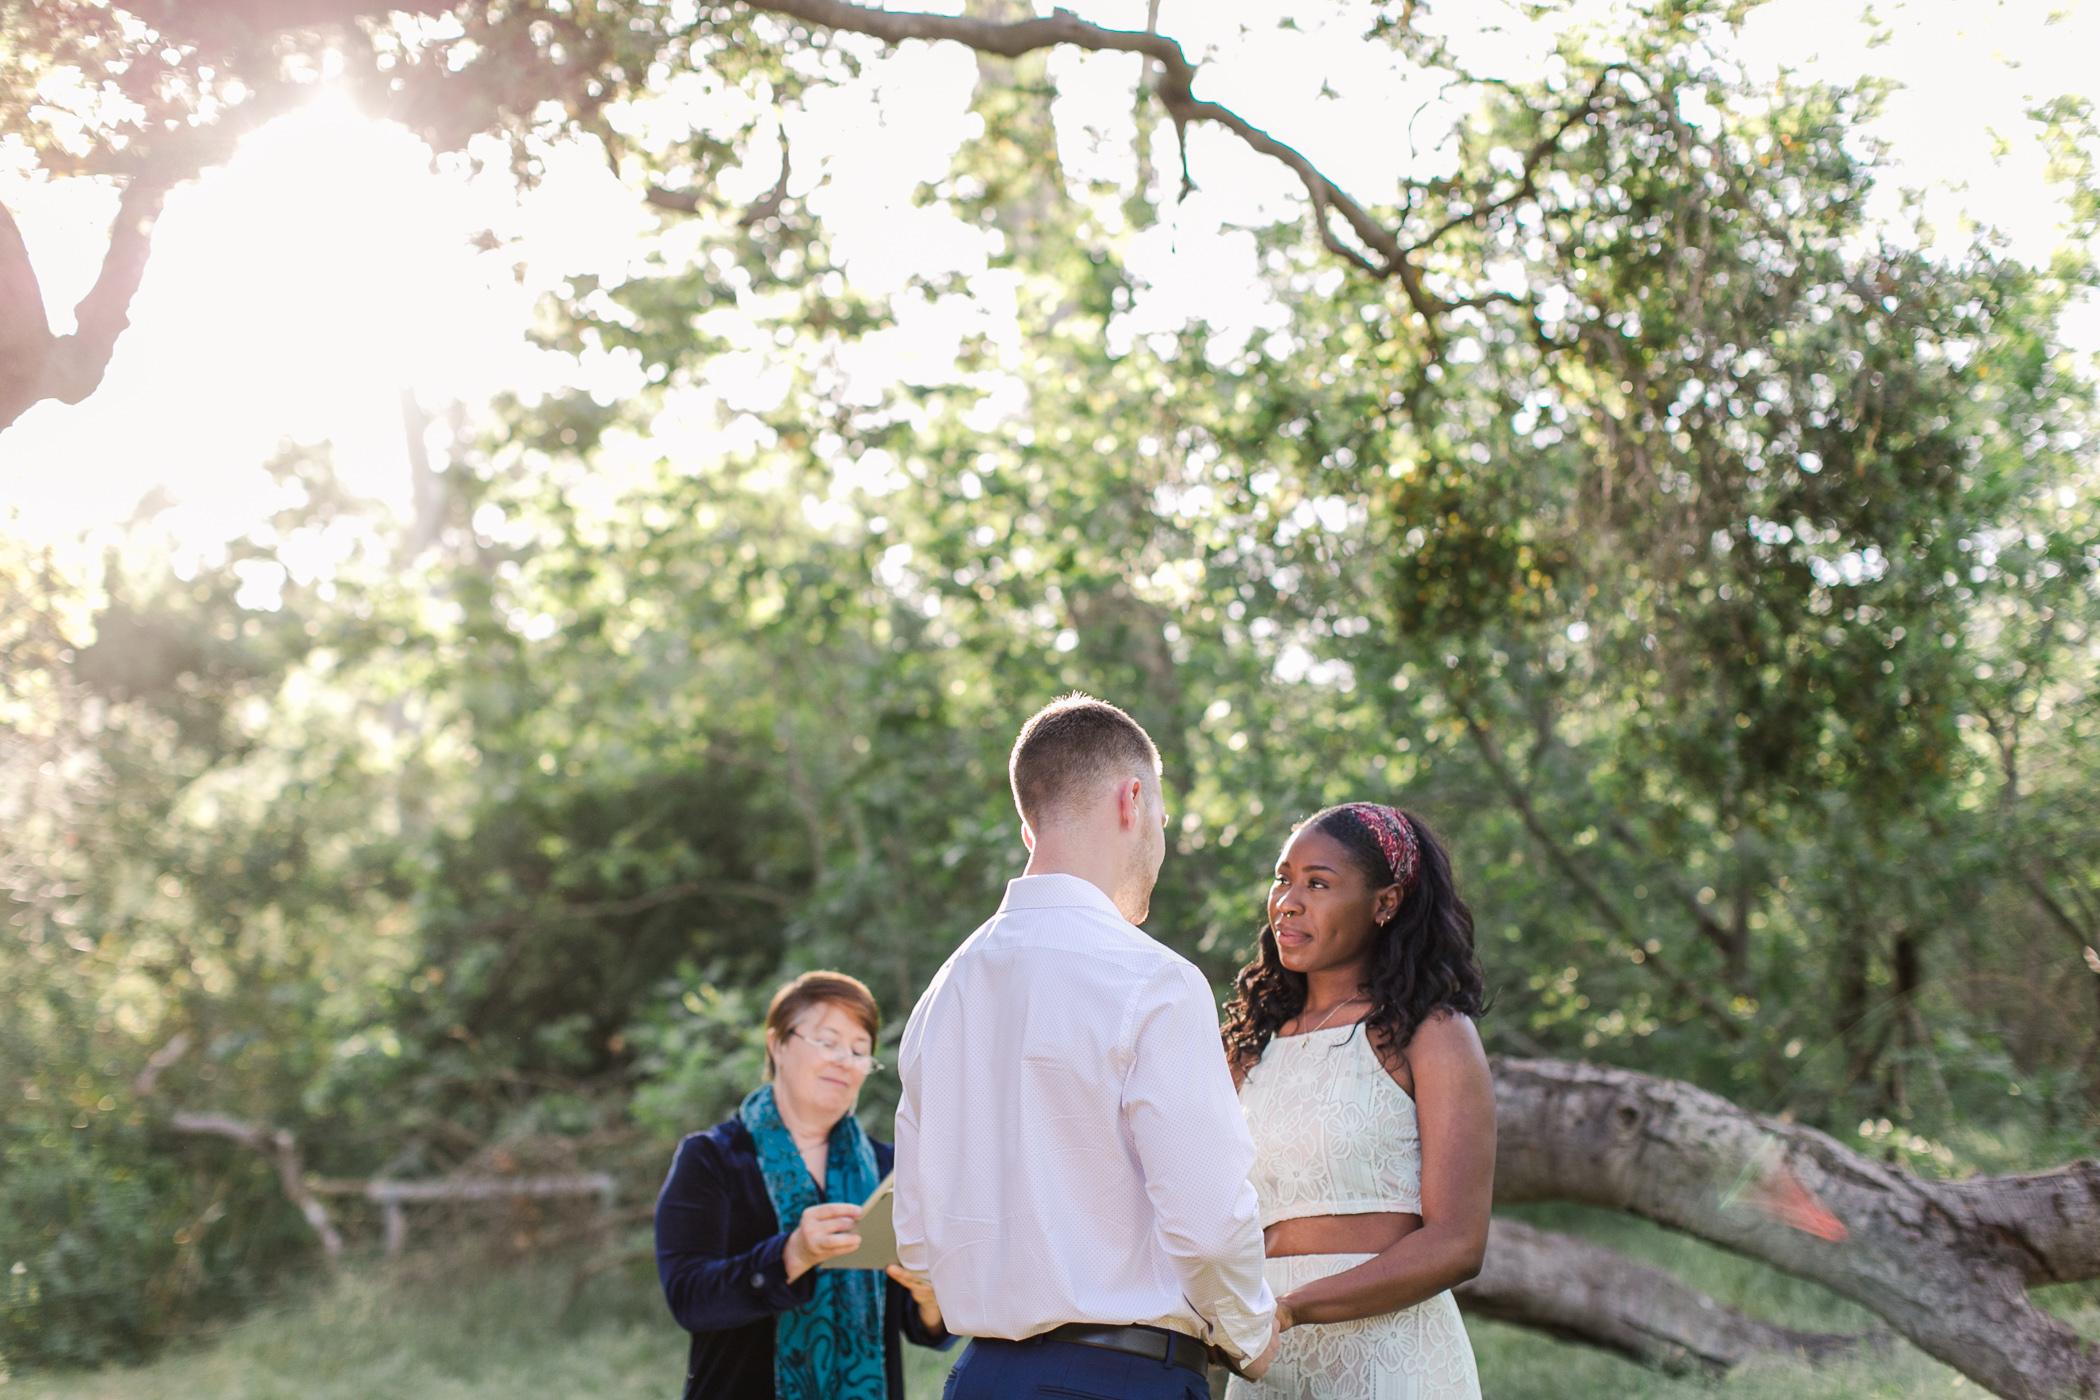 Outdoor elopement photography for adventurous couples